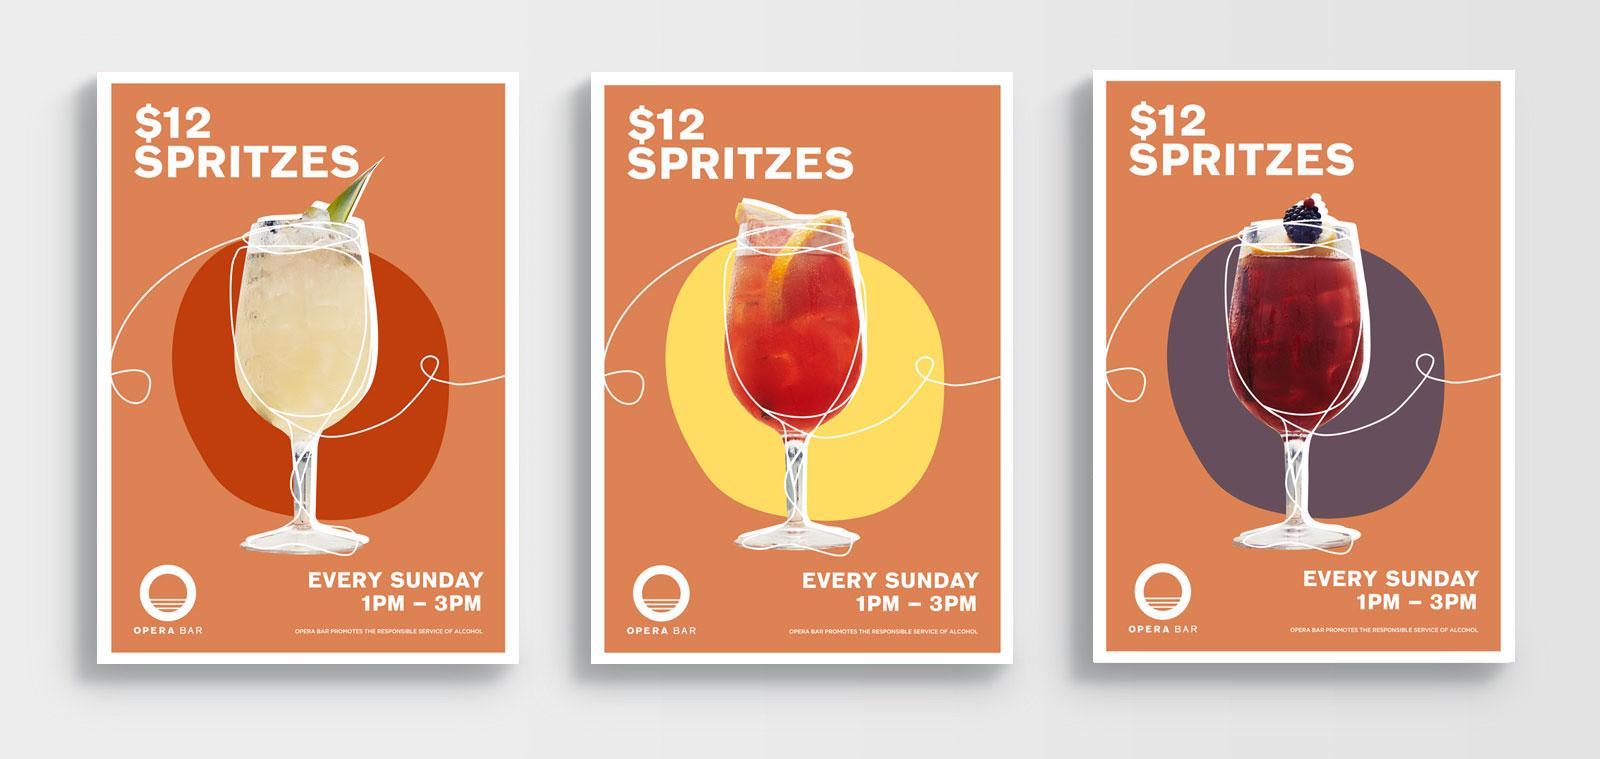 poster designs for cocktail spritz promotions at opera bar sydney